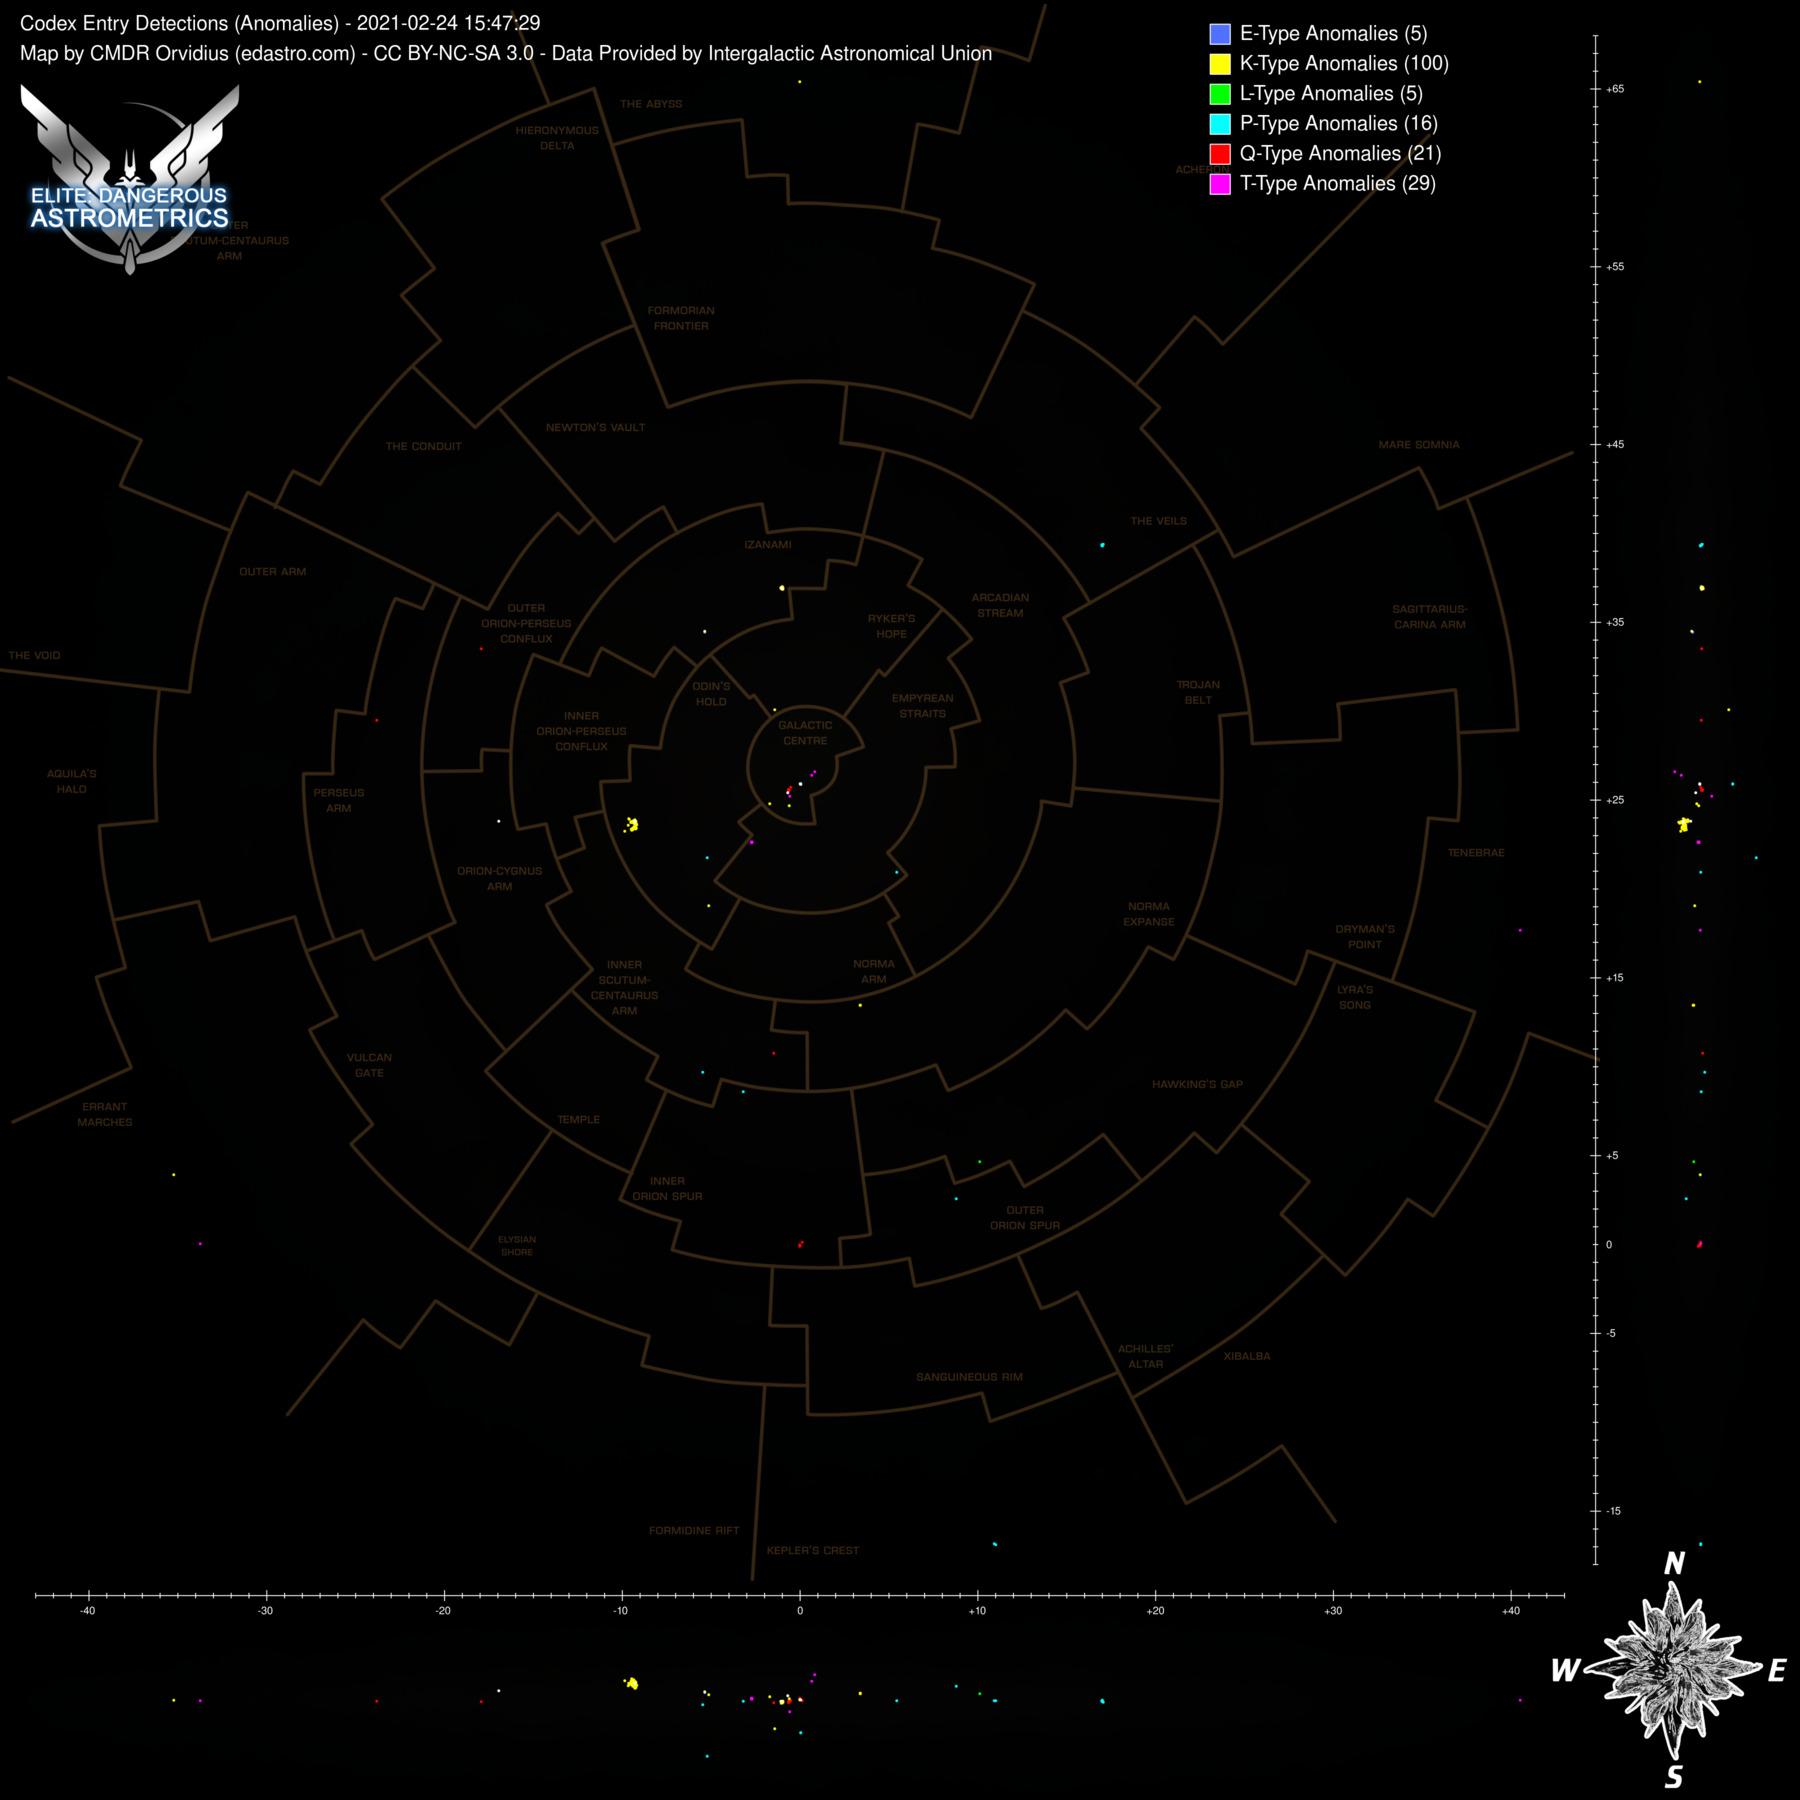 IGAU-Codex-anomalies-regions.jpg